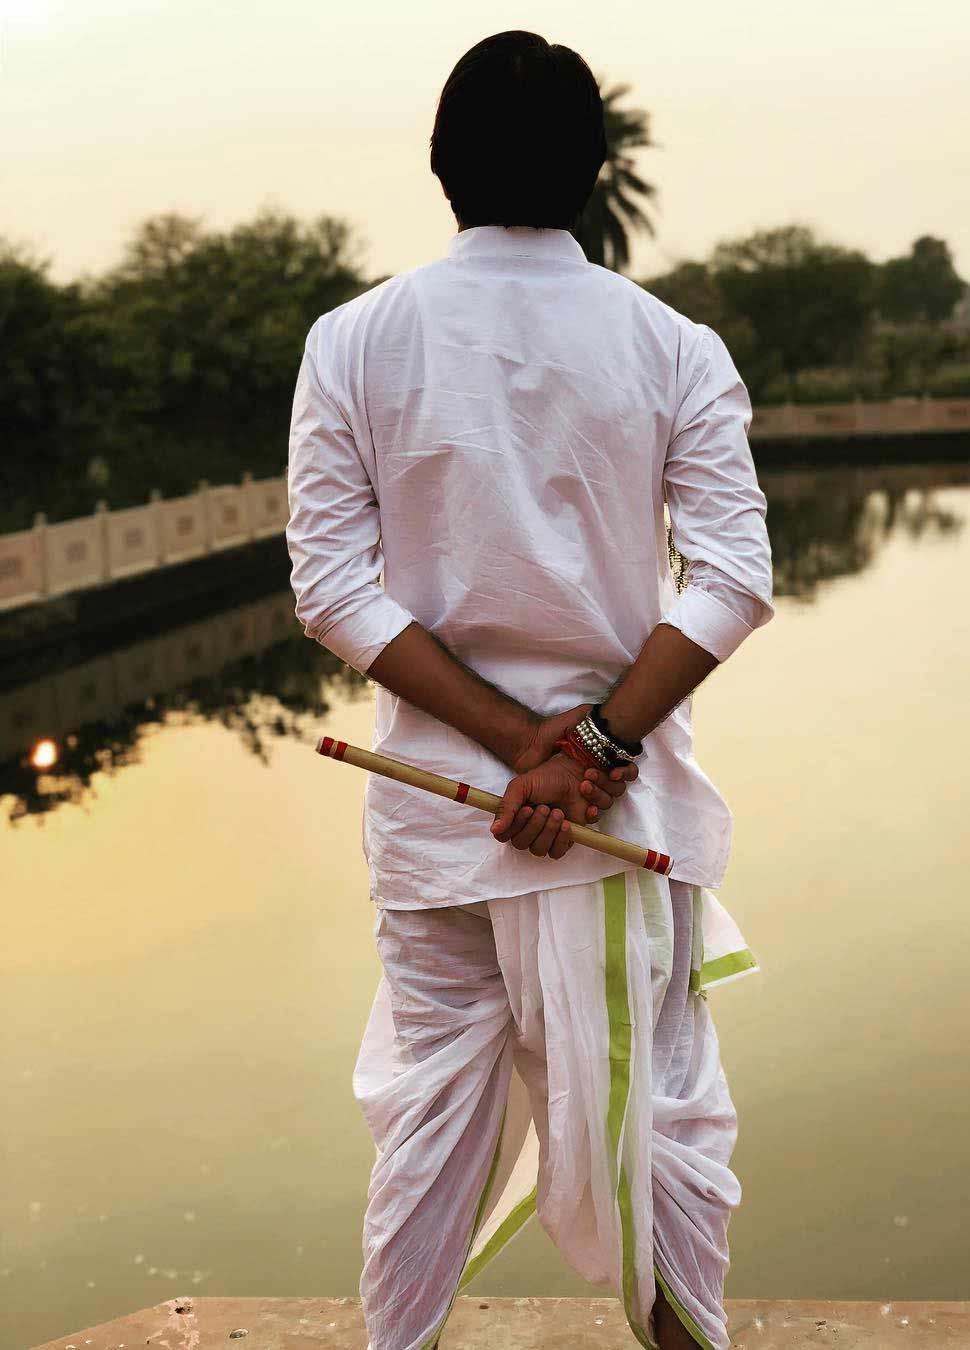 Tej Pratap Yadav appears in Krishna avatar in mathura and share his photos social media